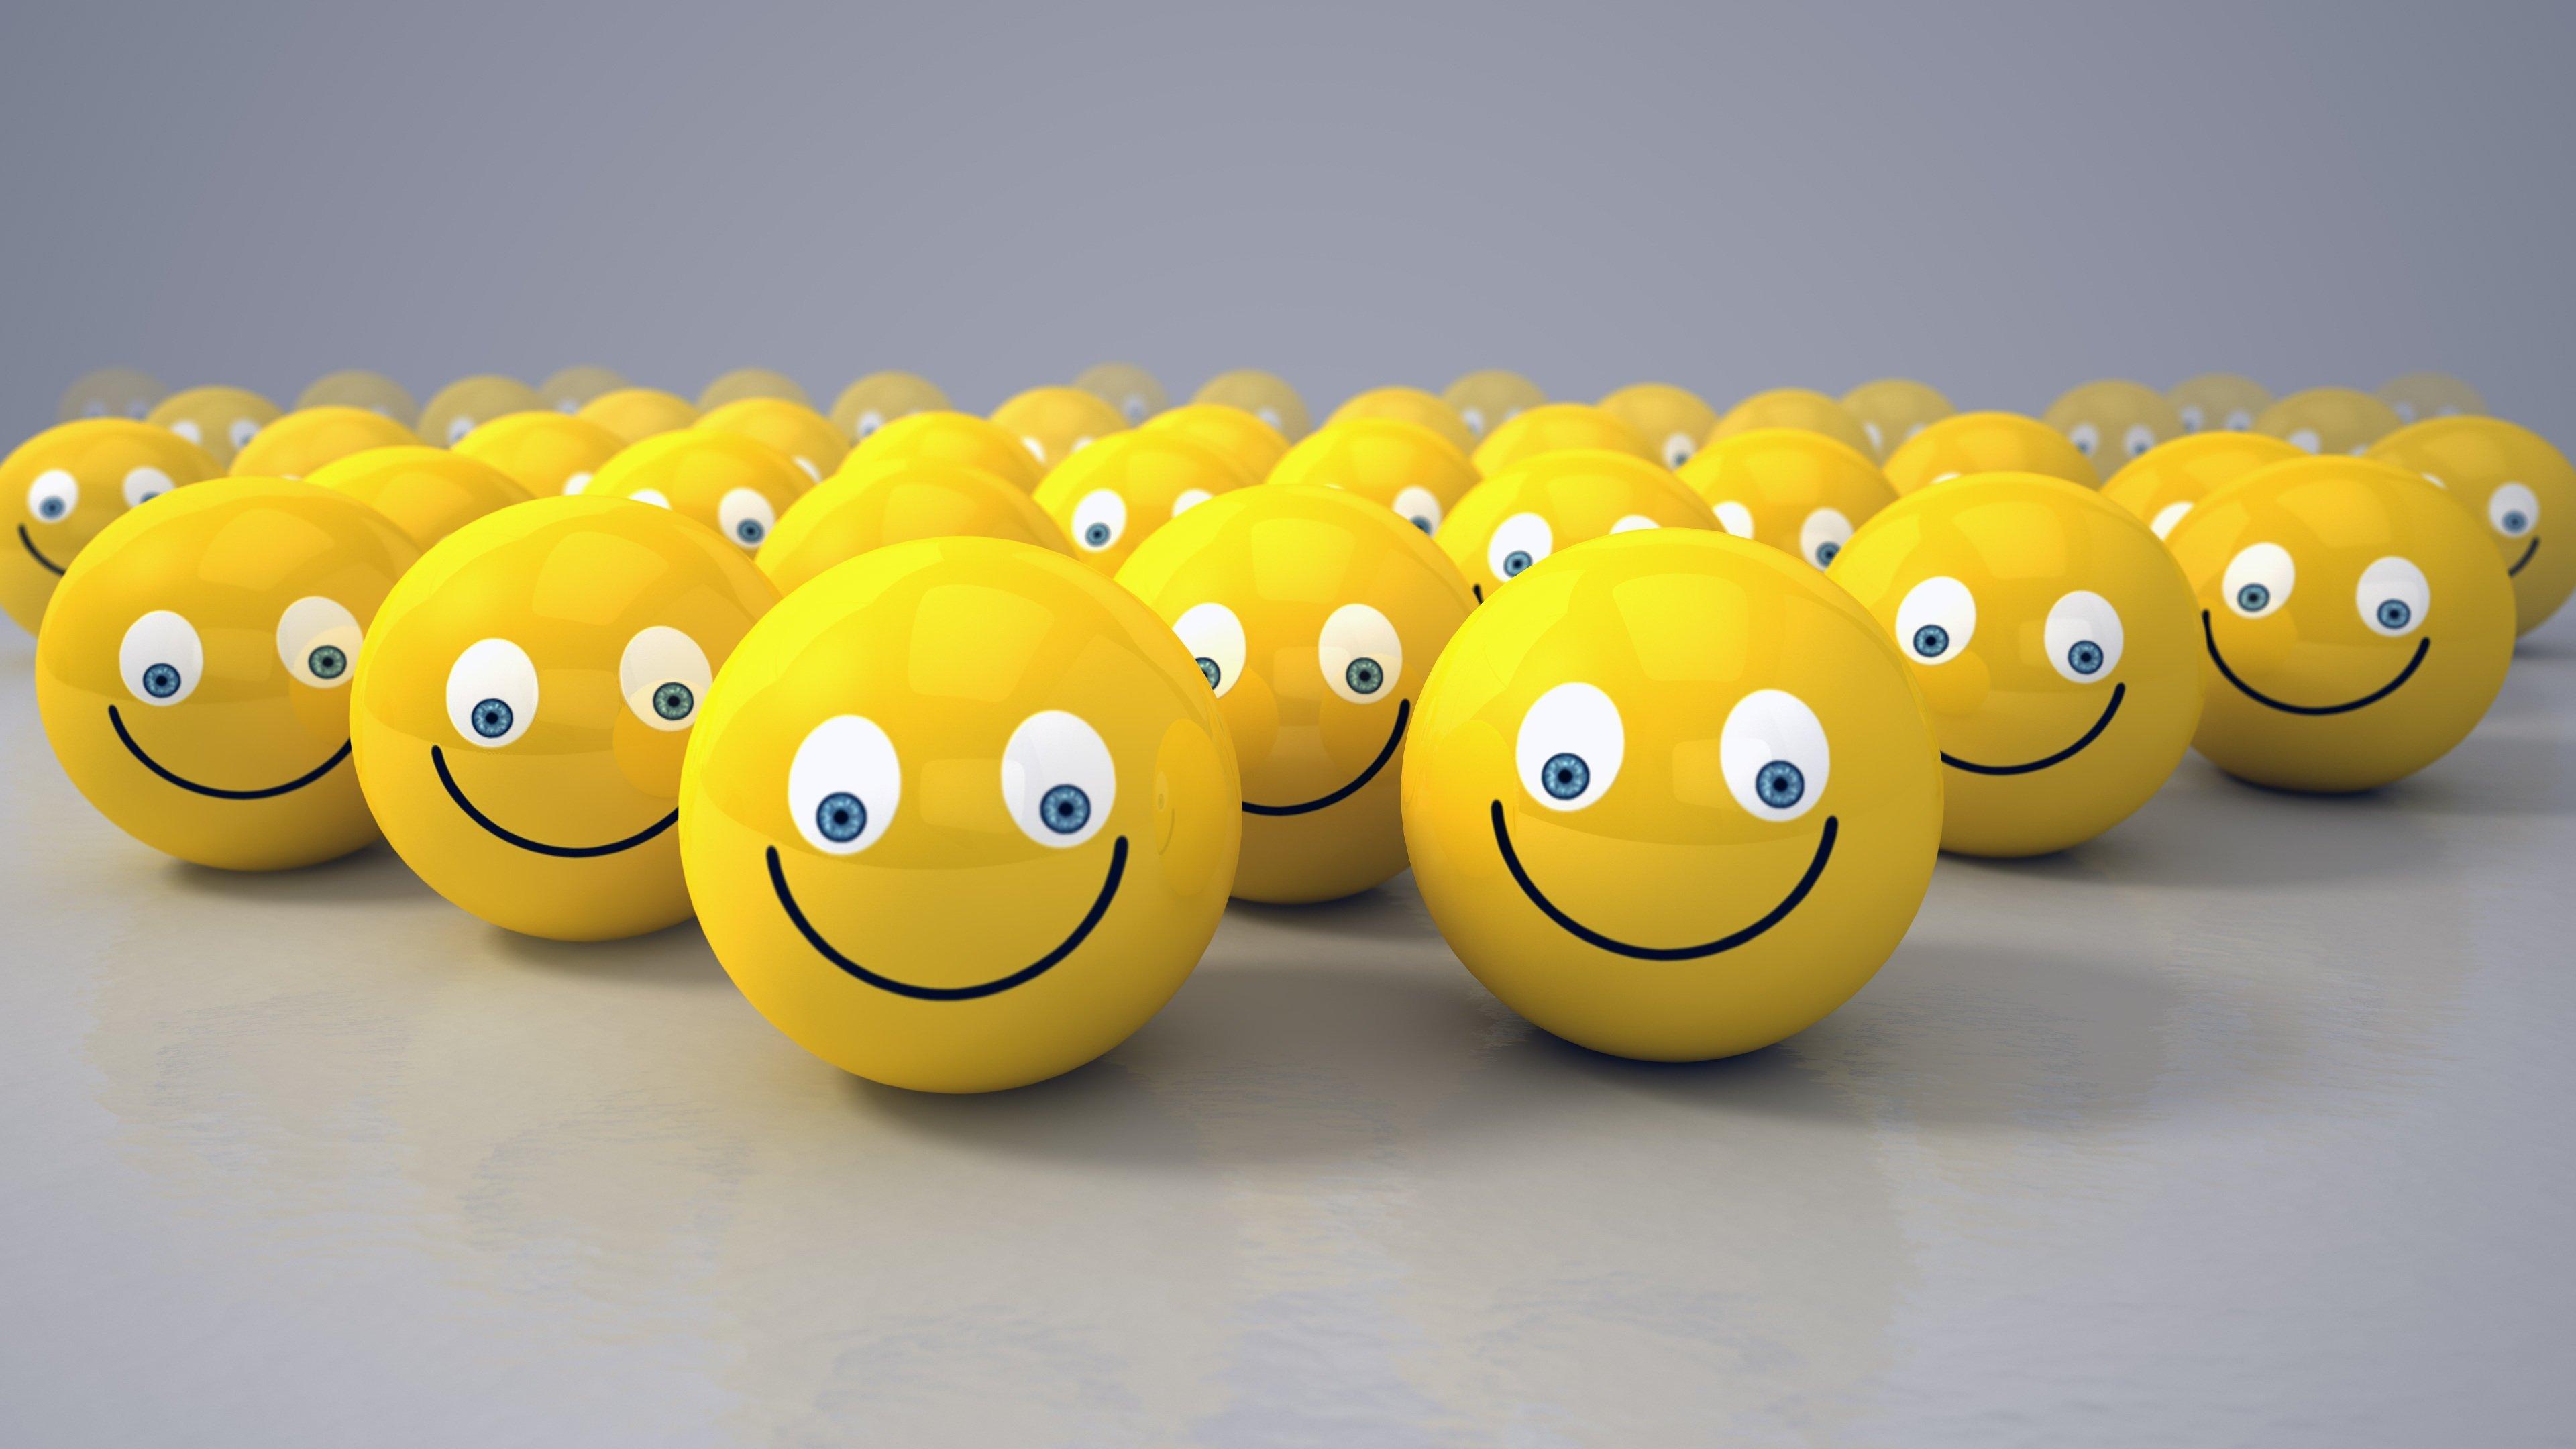 smiley wallpapers 3840x2160 ultra hd 4k desktop backgrounds